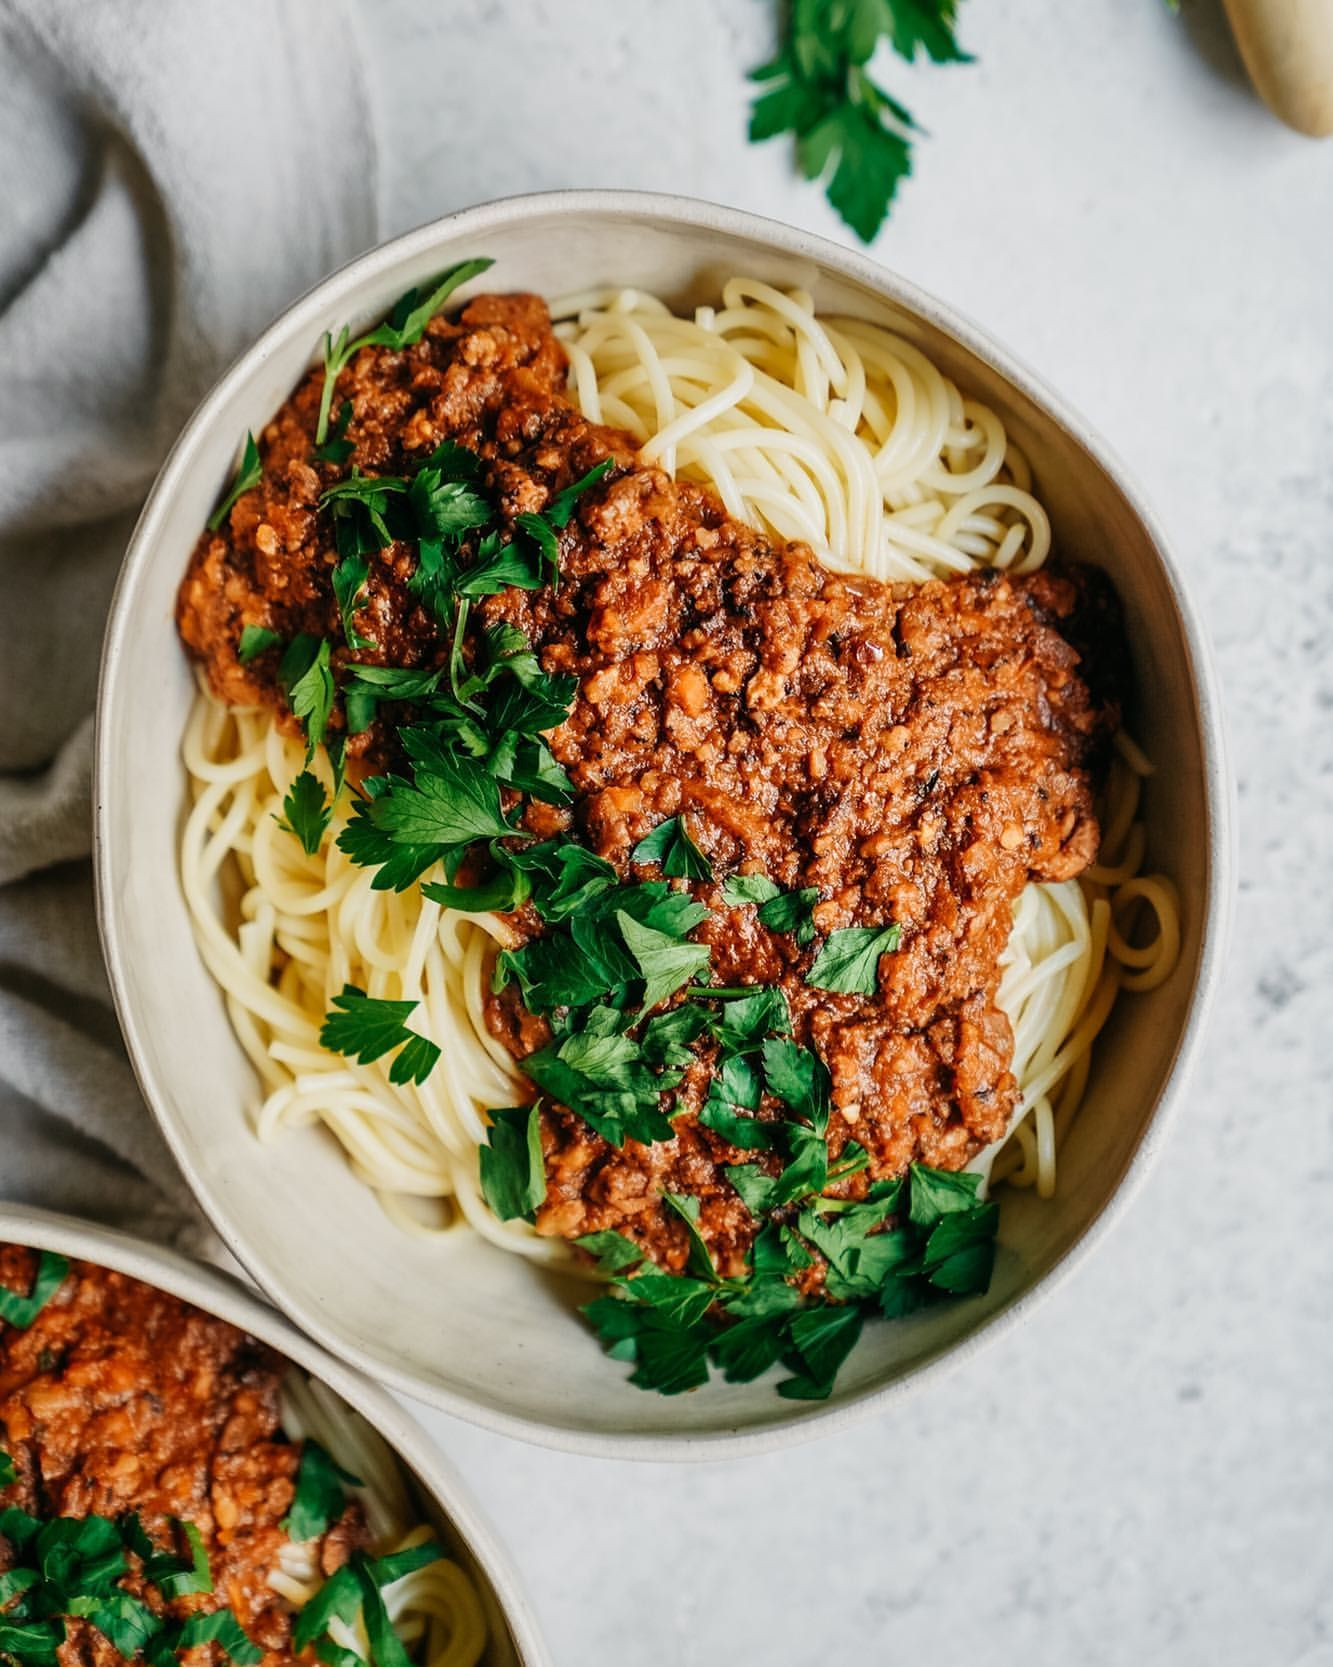 Spaghetti with Mushroom Walnut Sauce